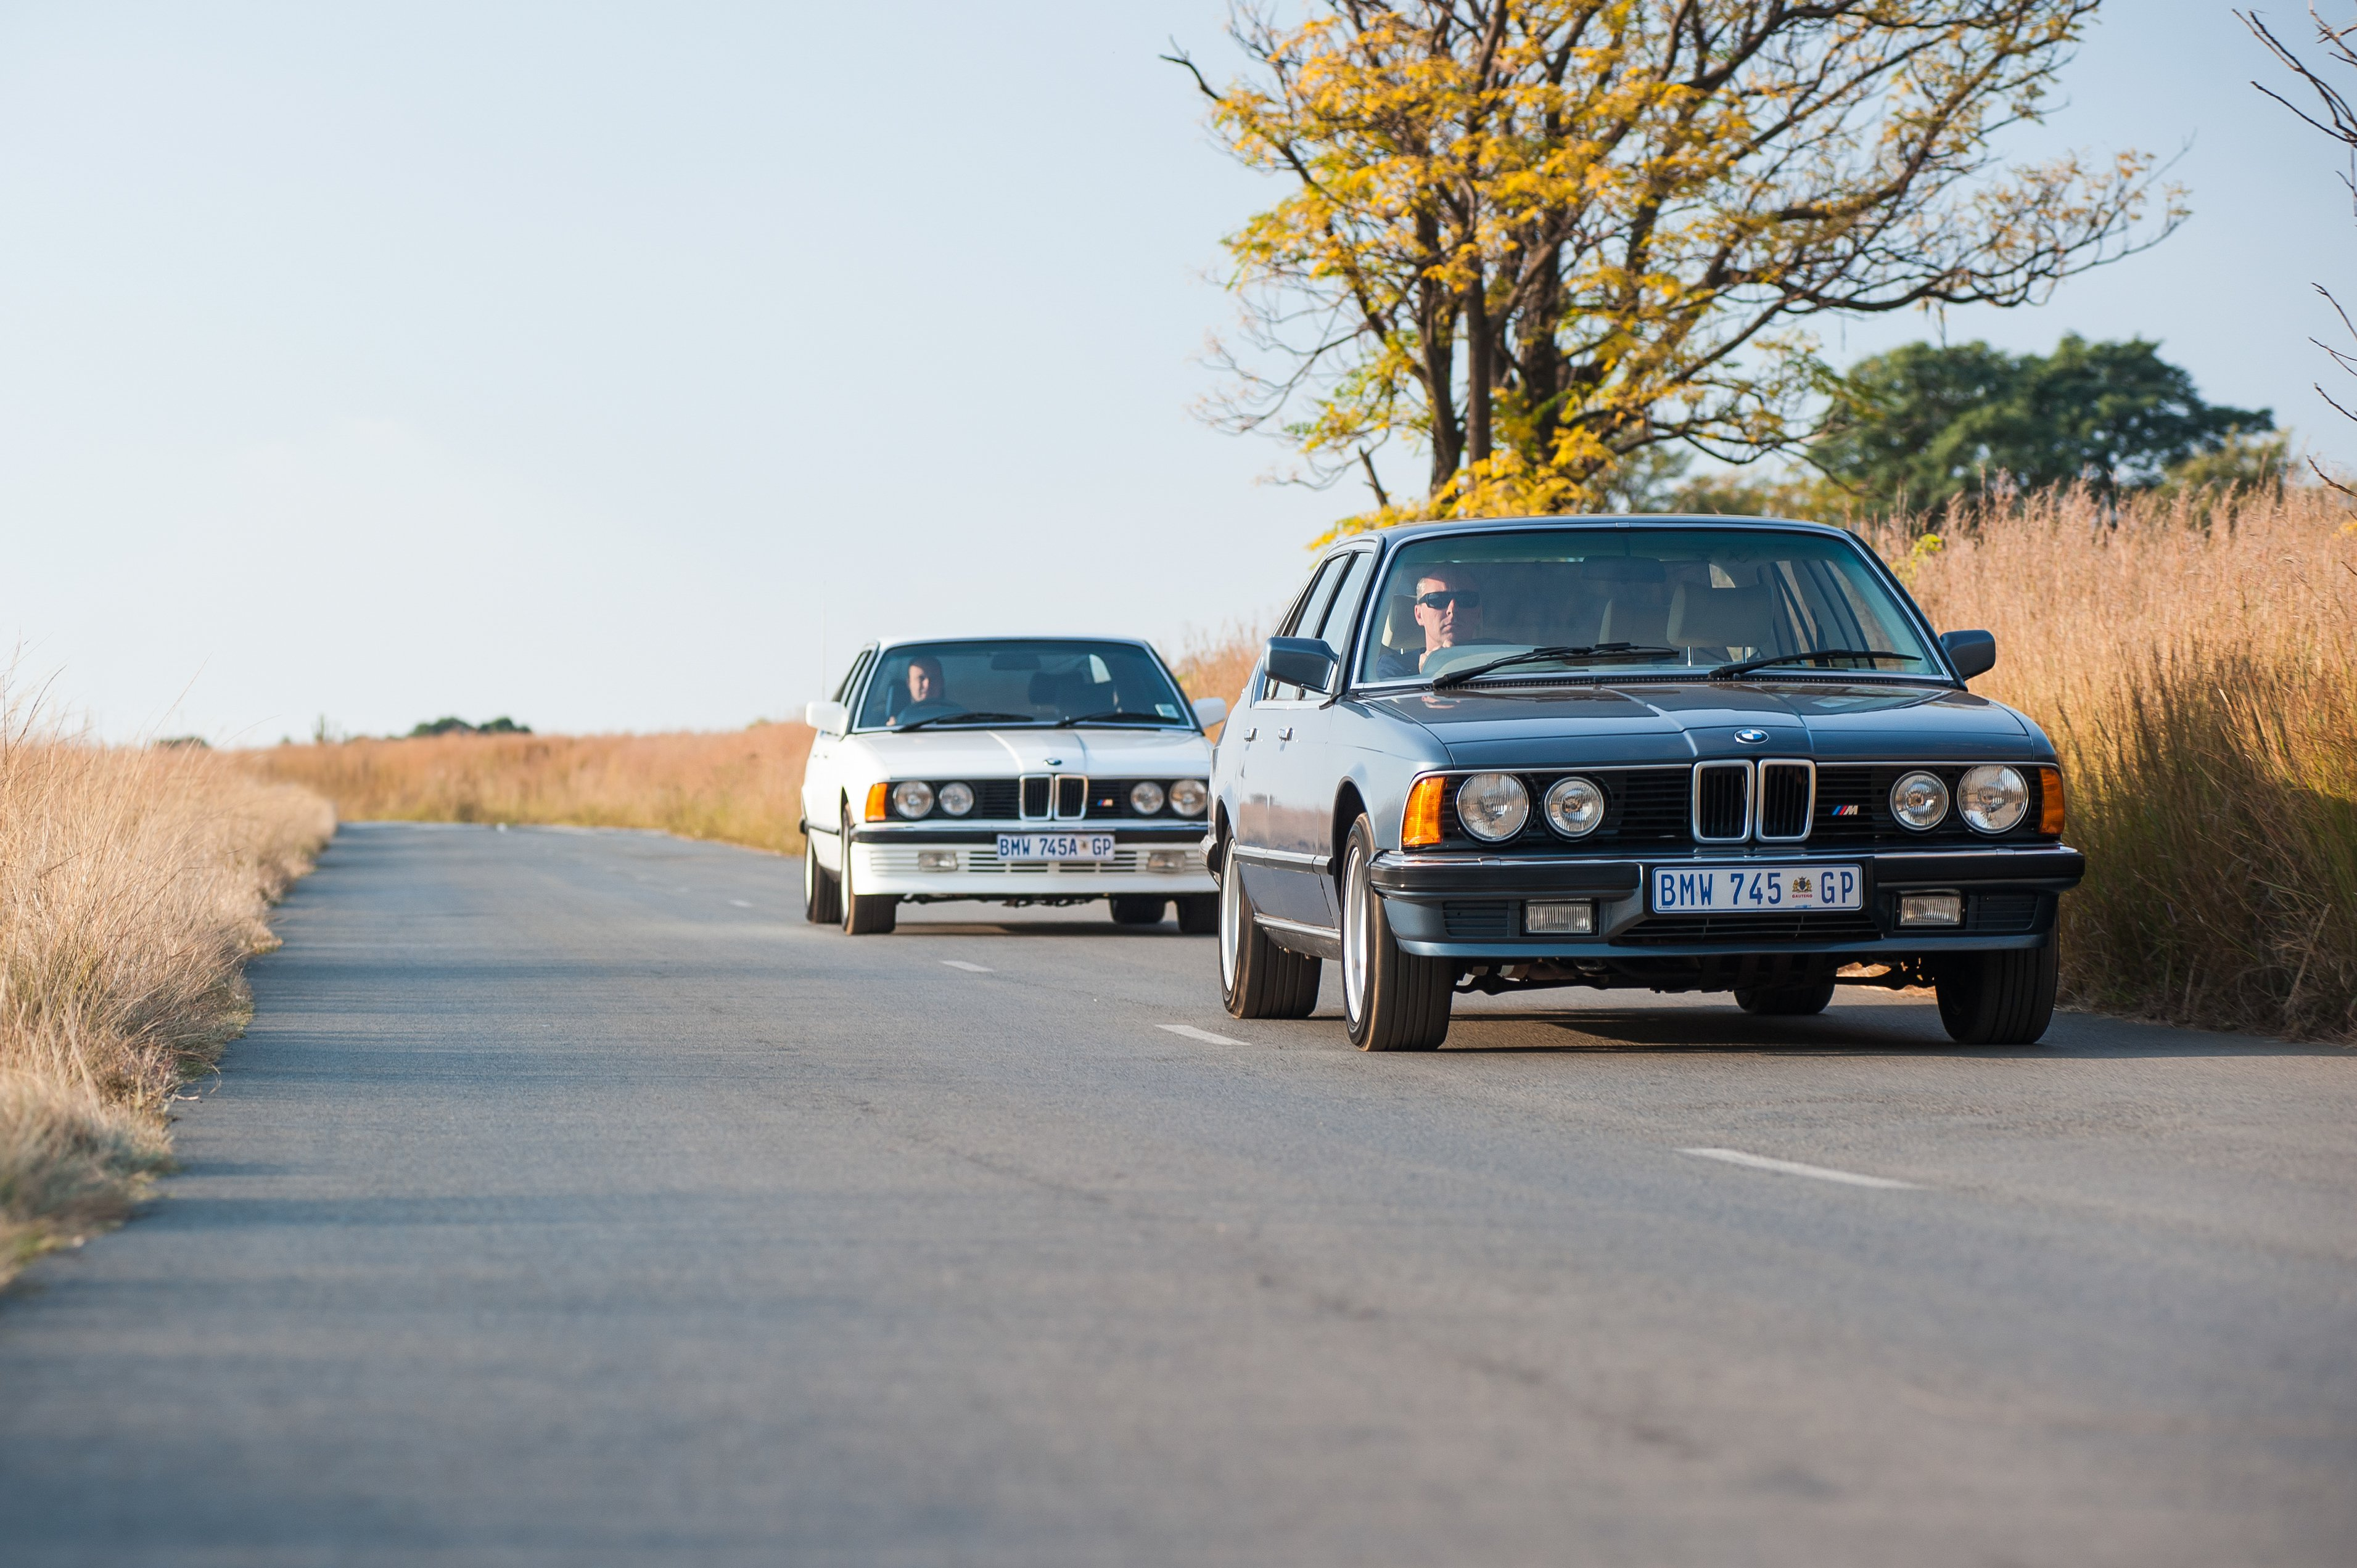 BMW 745 edited main (1 of 1).jpg